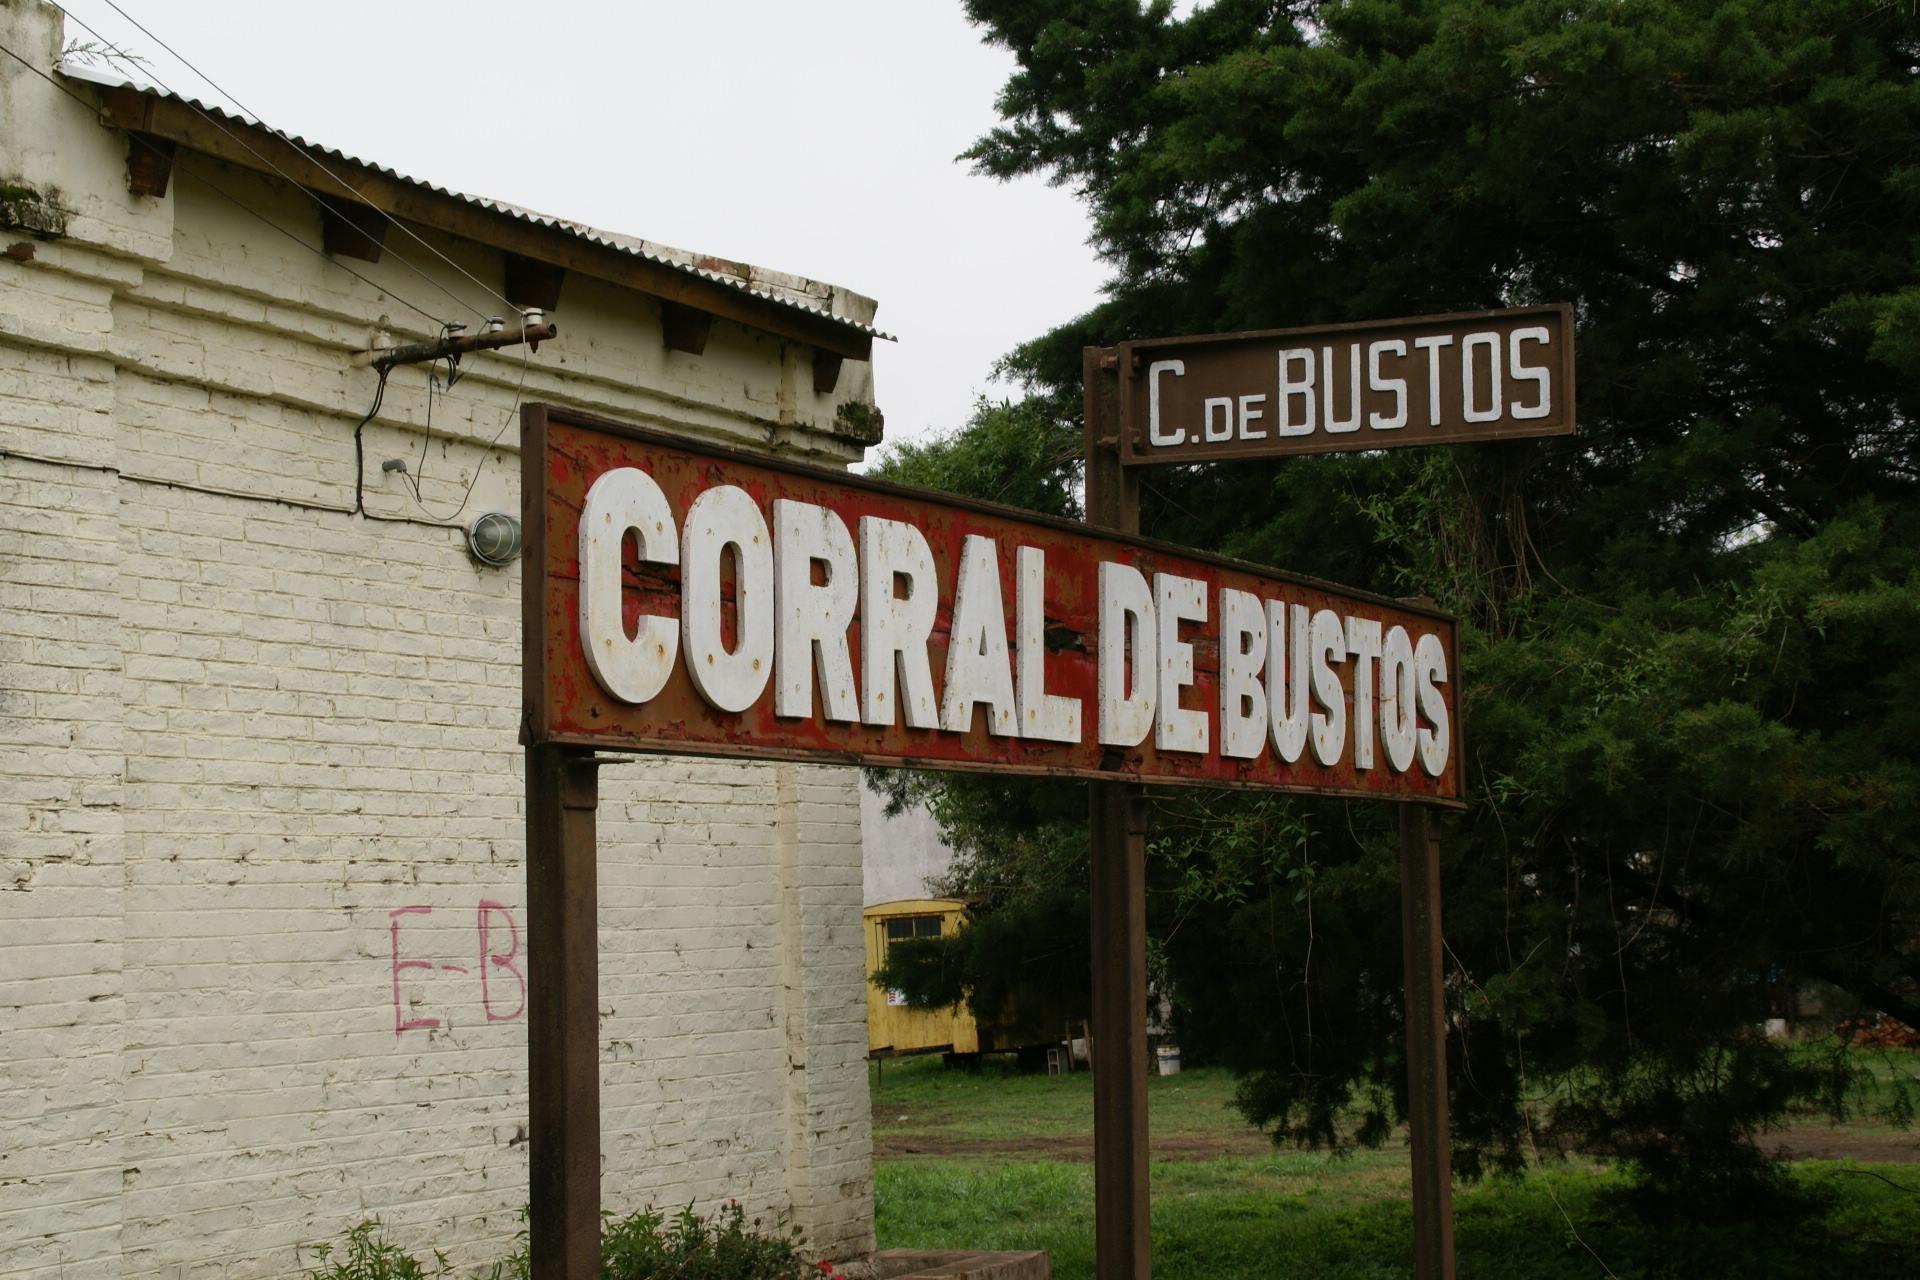 http://upload.wikimedia.org/wikipedia/commons/6/60/2011.10.19.090752_Train_station_Corral_de_Bustos_Argentina.jpg